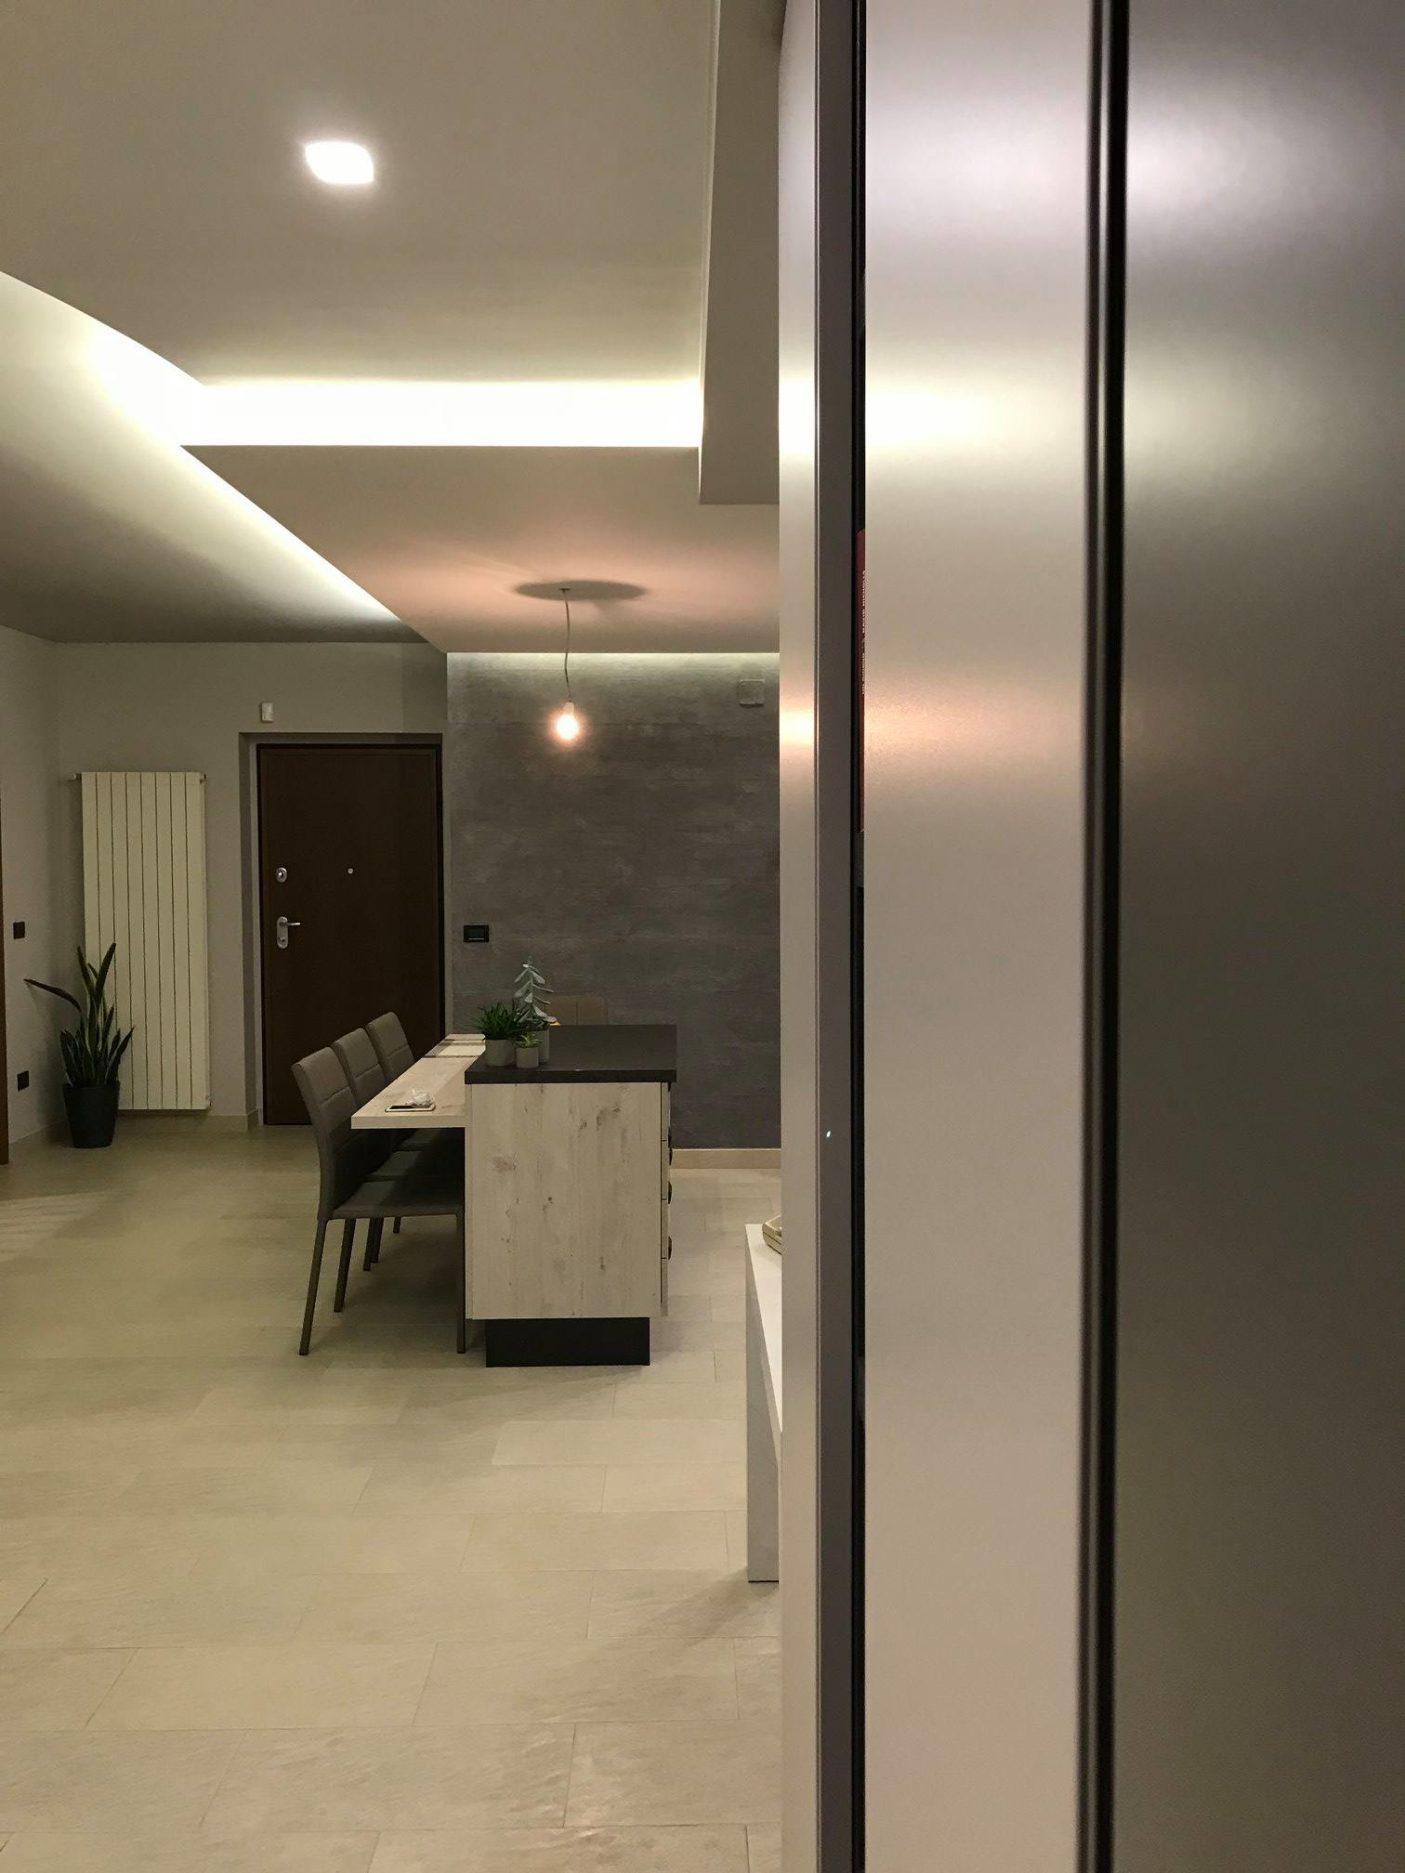 Zona-living-Doimo-salotto-camera-da-letto-Novamobili1.jpg